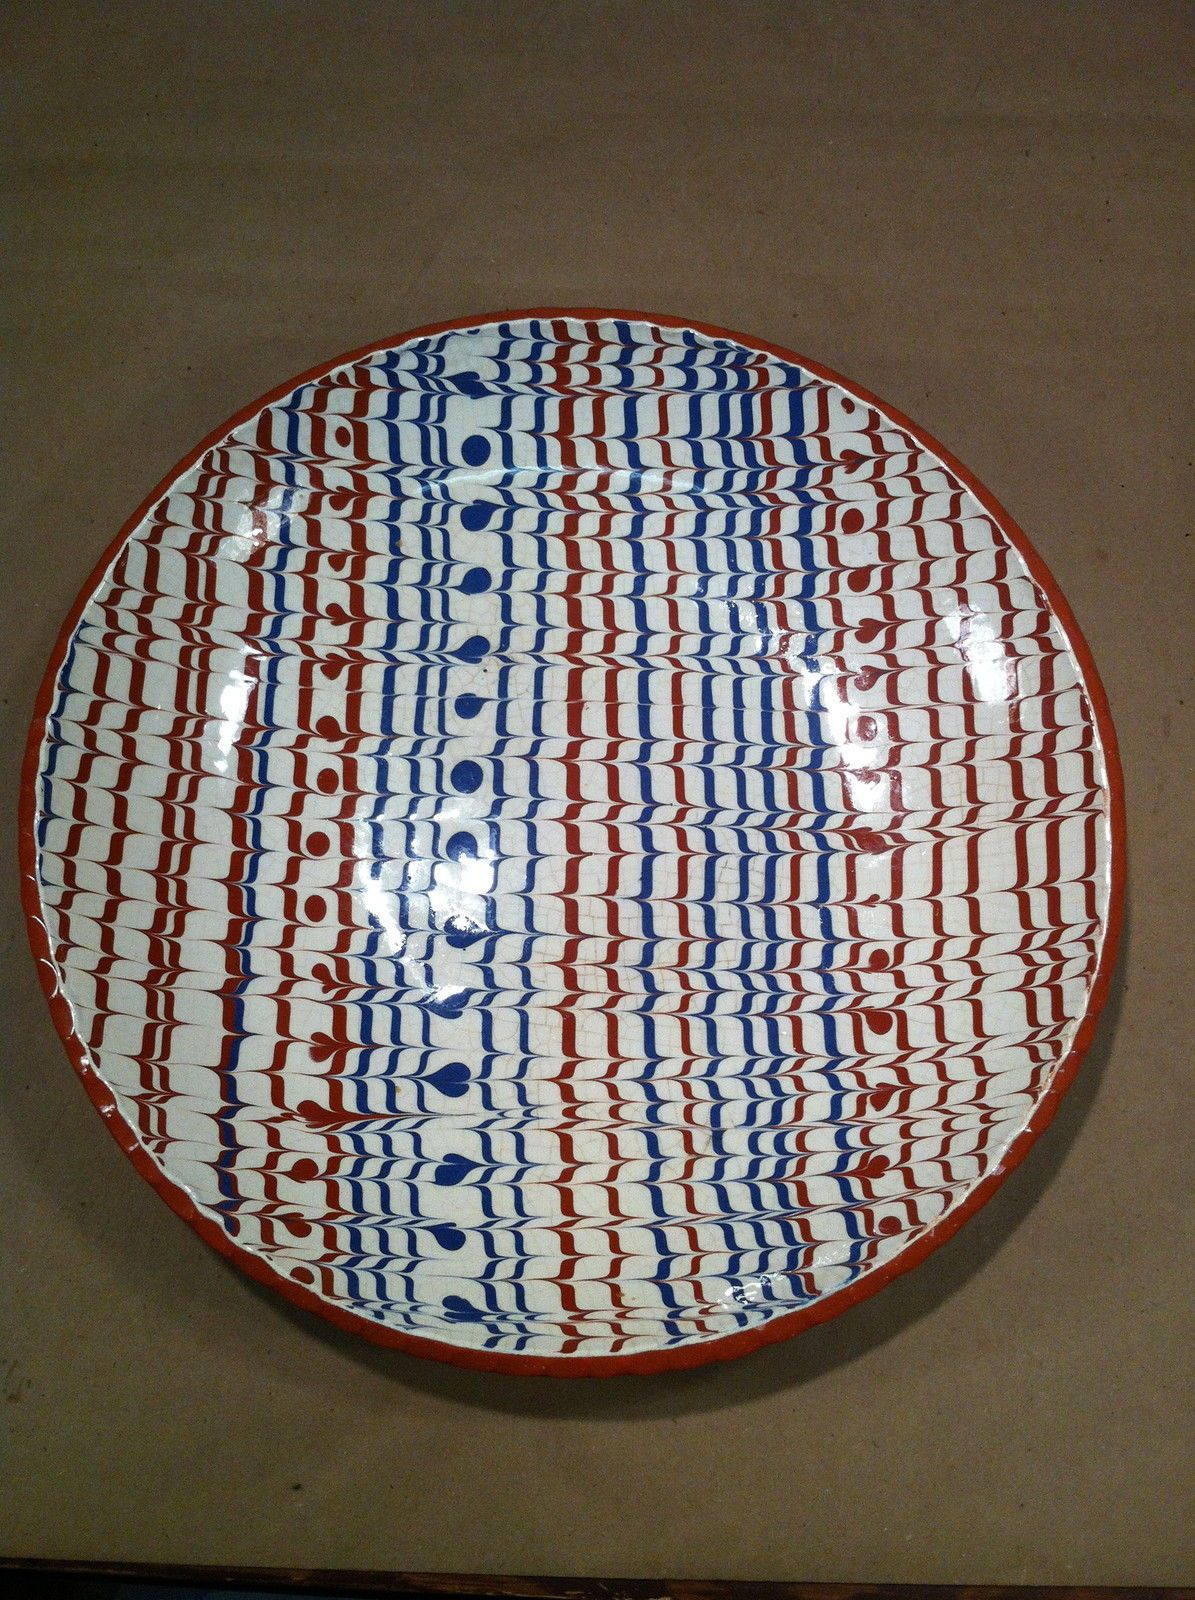 Slip decorate Redware Plate redwhite \u0026 blue Combed feather slipware Pottery & Slip decorate Redware Plate: redwhite \u0026 blue Combed feather ...